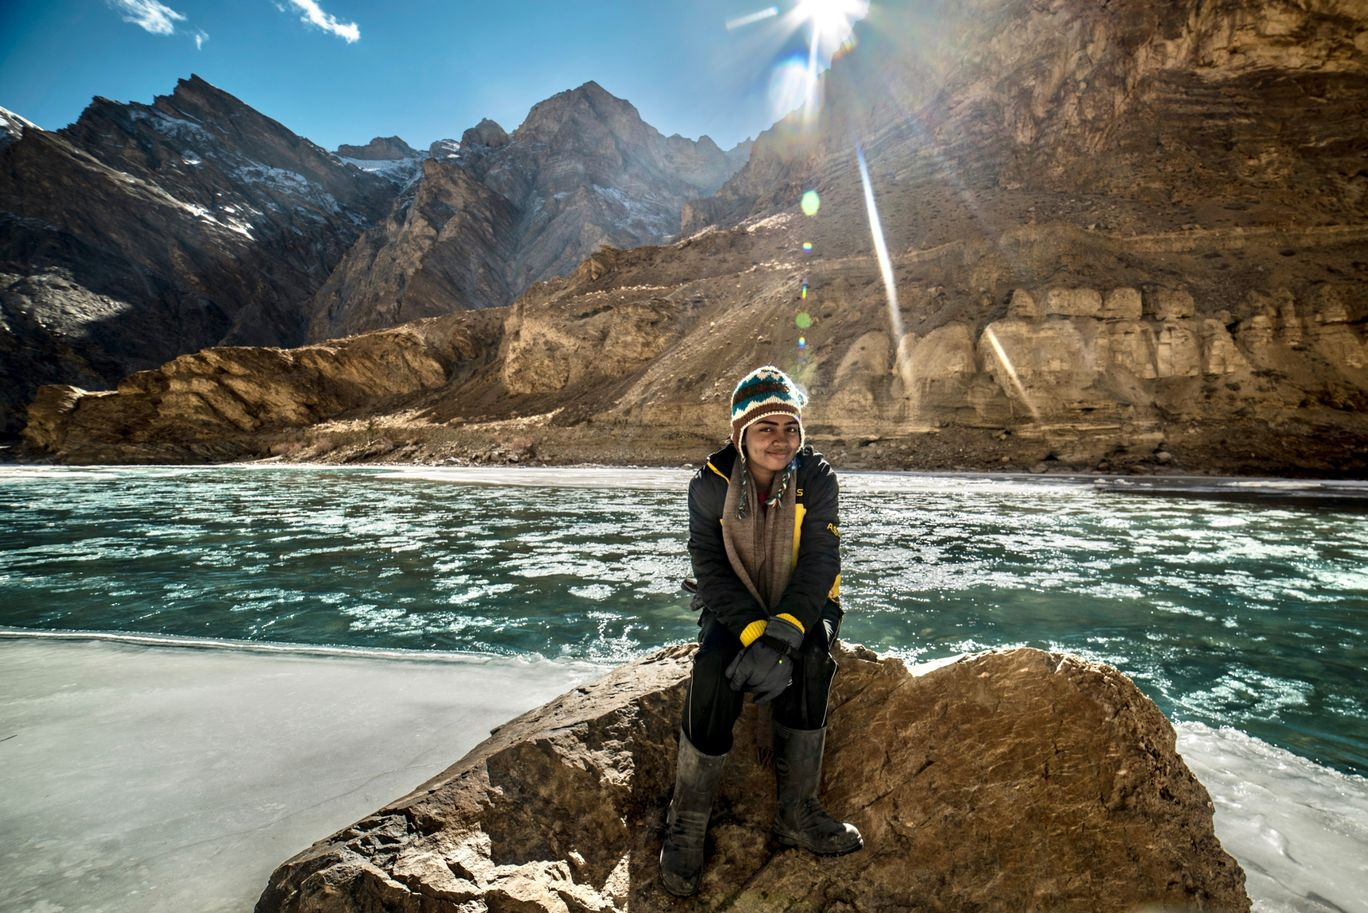 Photo of Chadar trek - Trekking In Ladakh - Frozen River Trekking In Ladakh By Nivetha Kannan